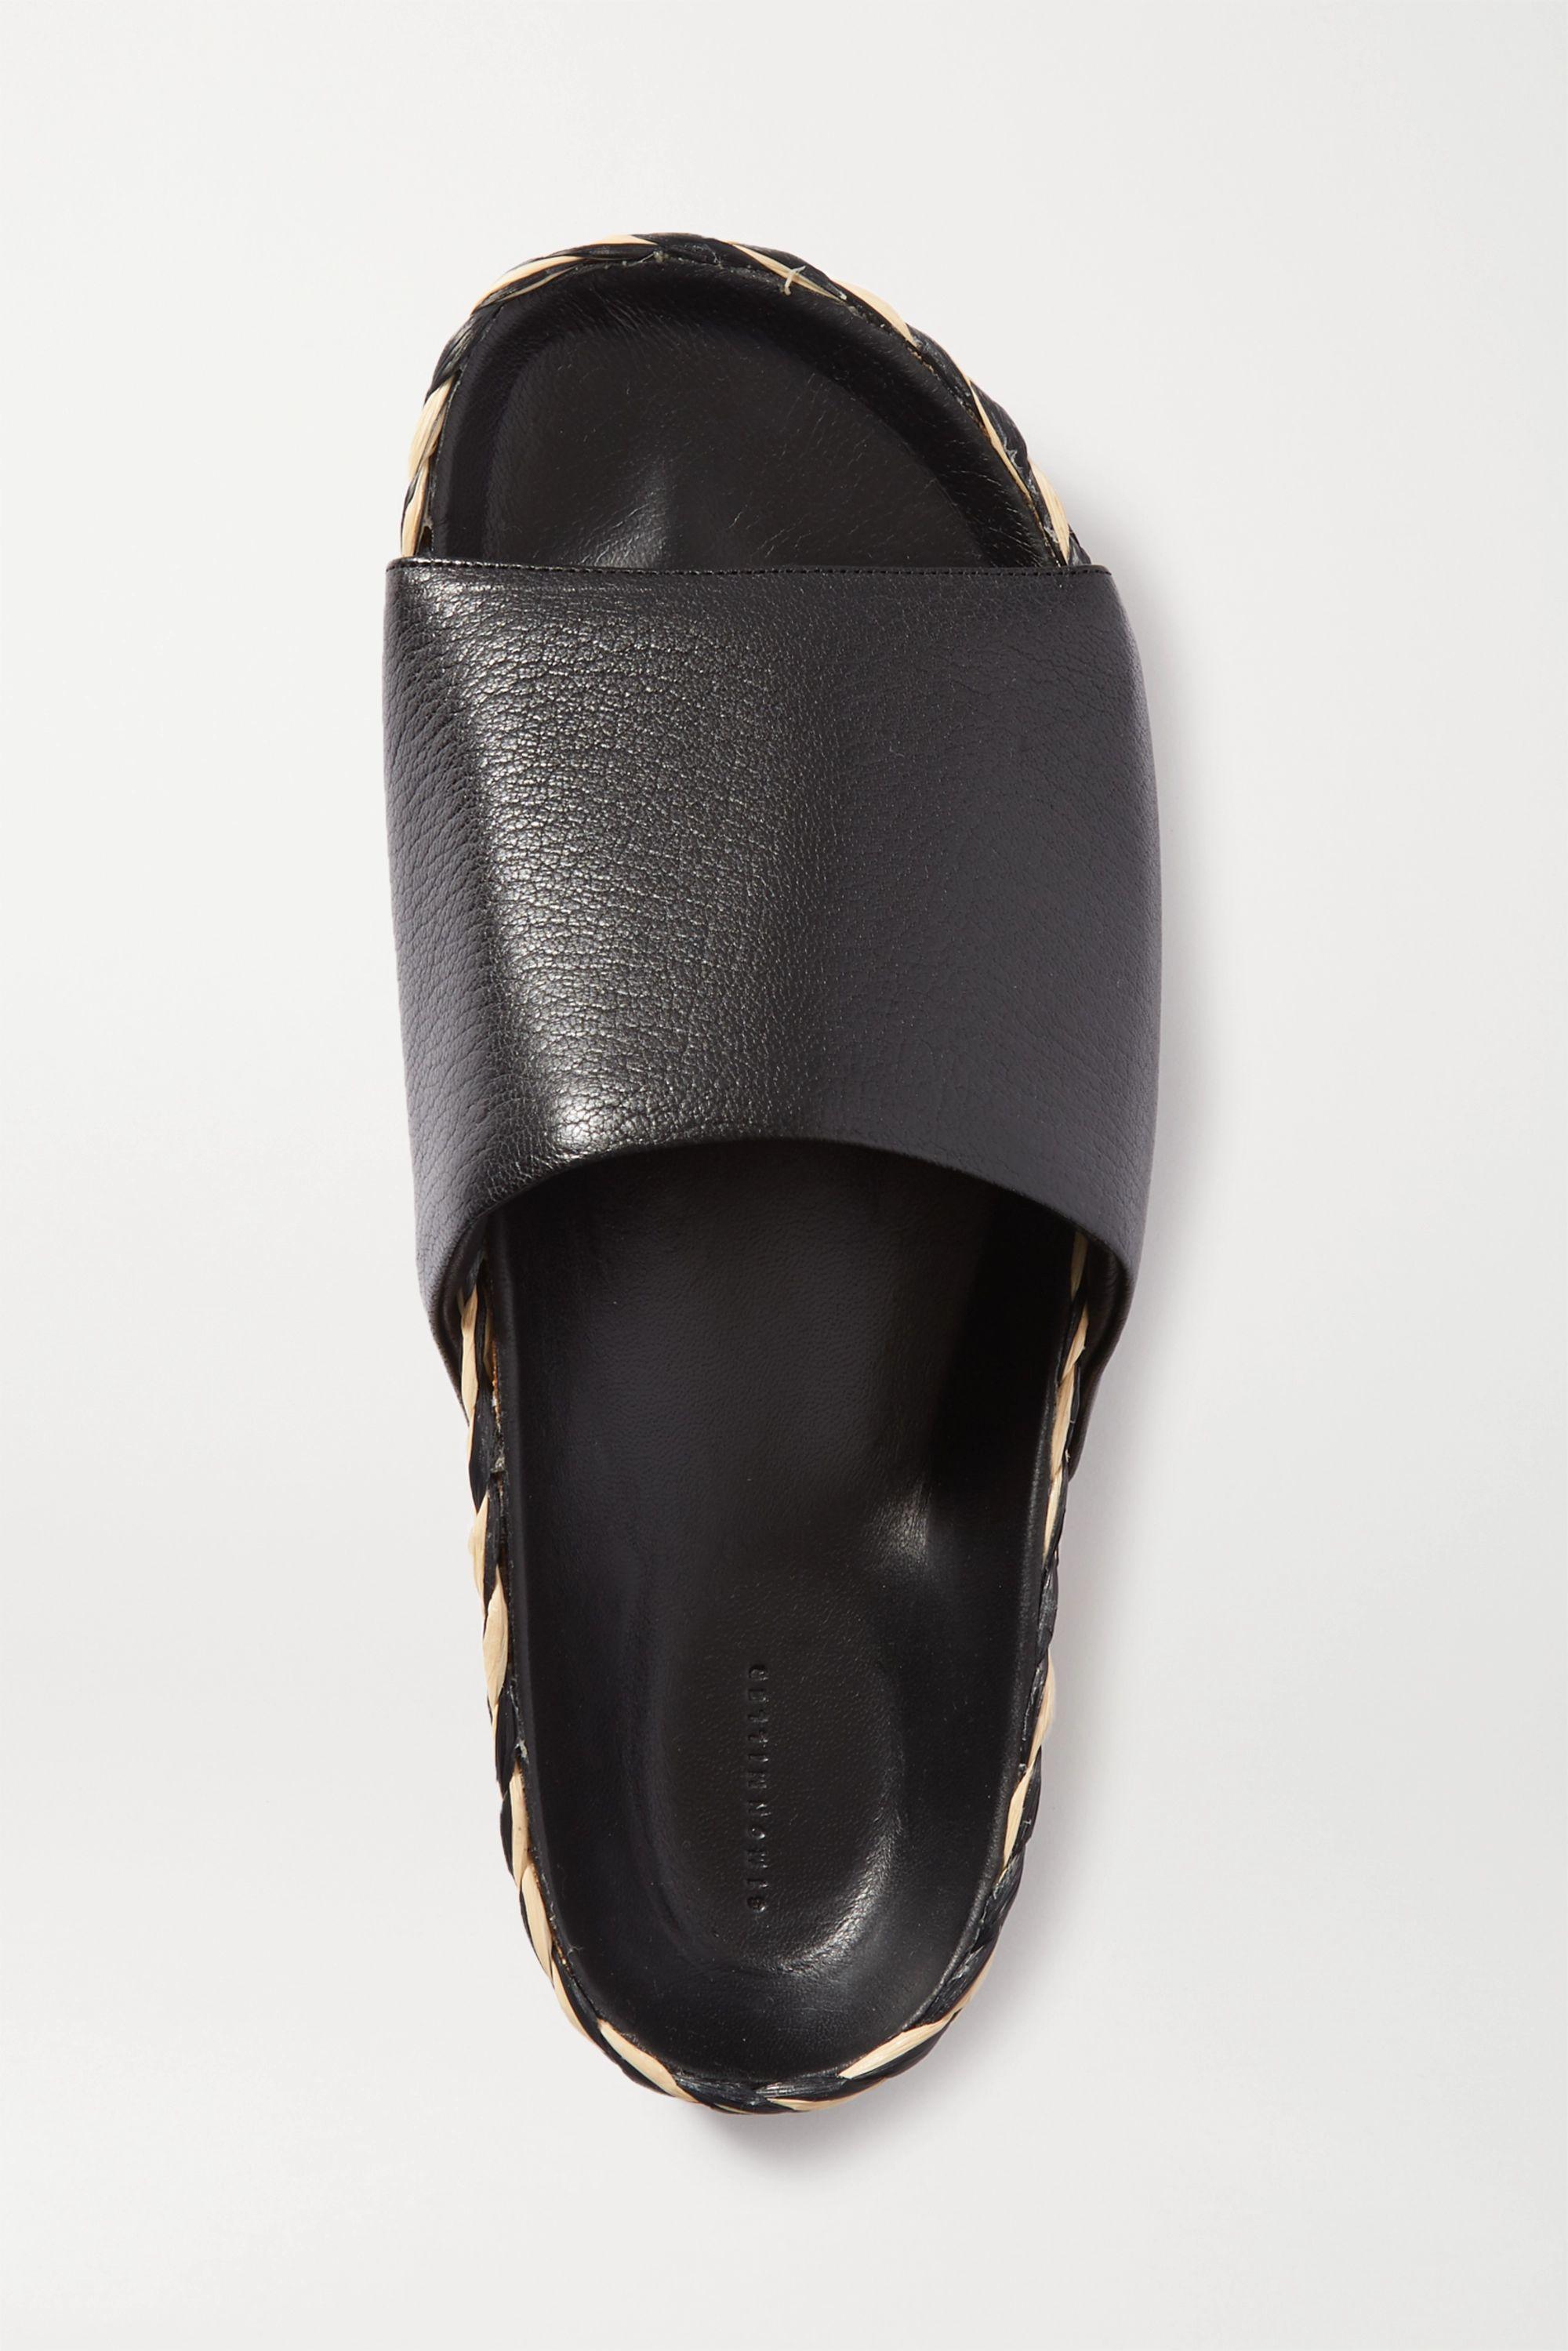 SIMON MILLER Mud leather espadrille platform sandals